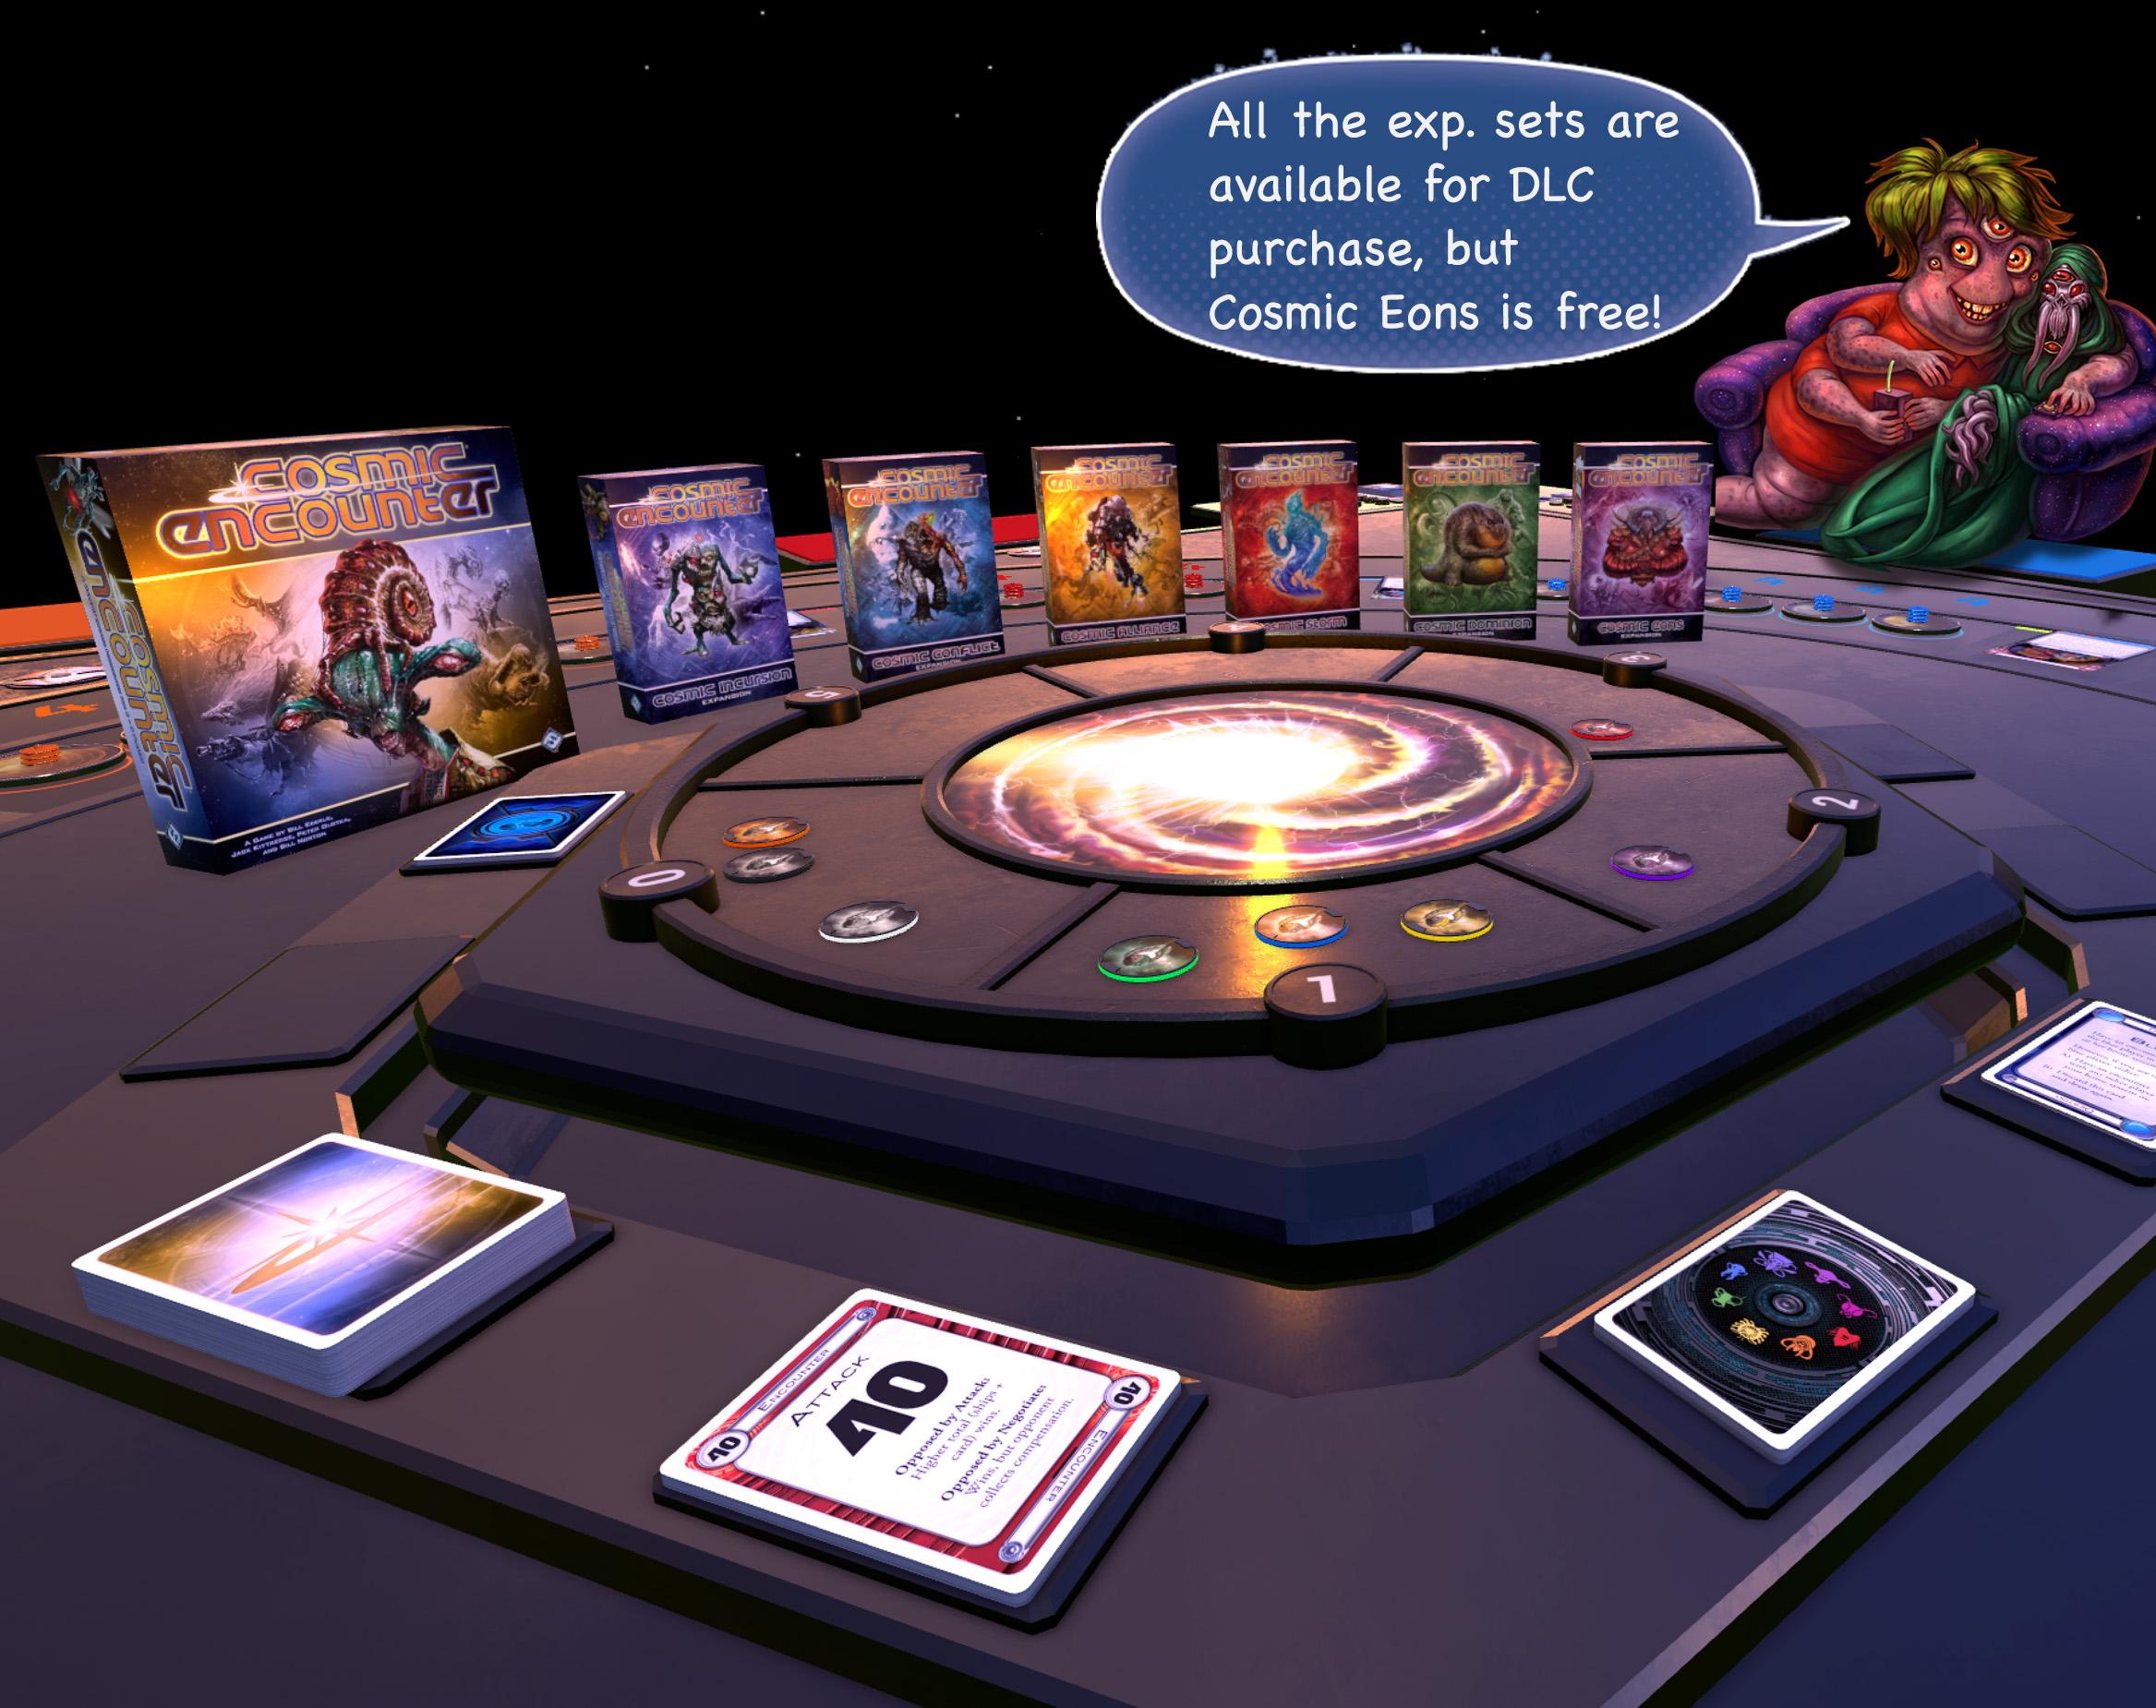 playnow-gamesetup13.jpg